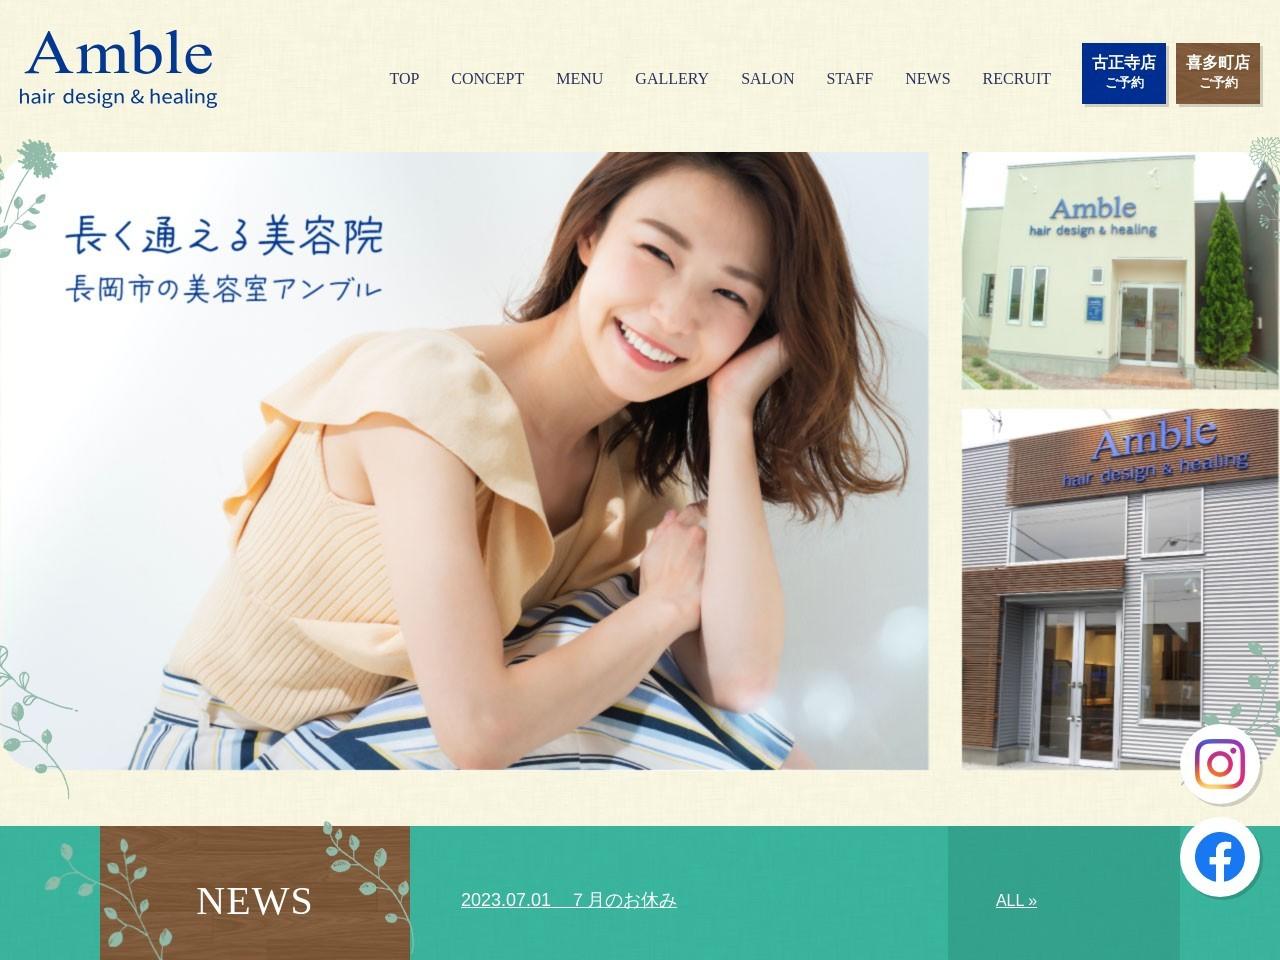 Amble